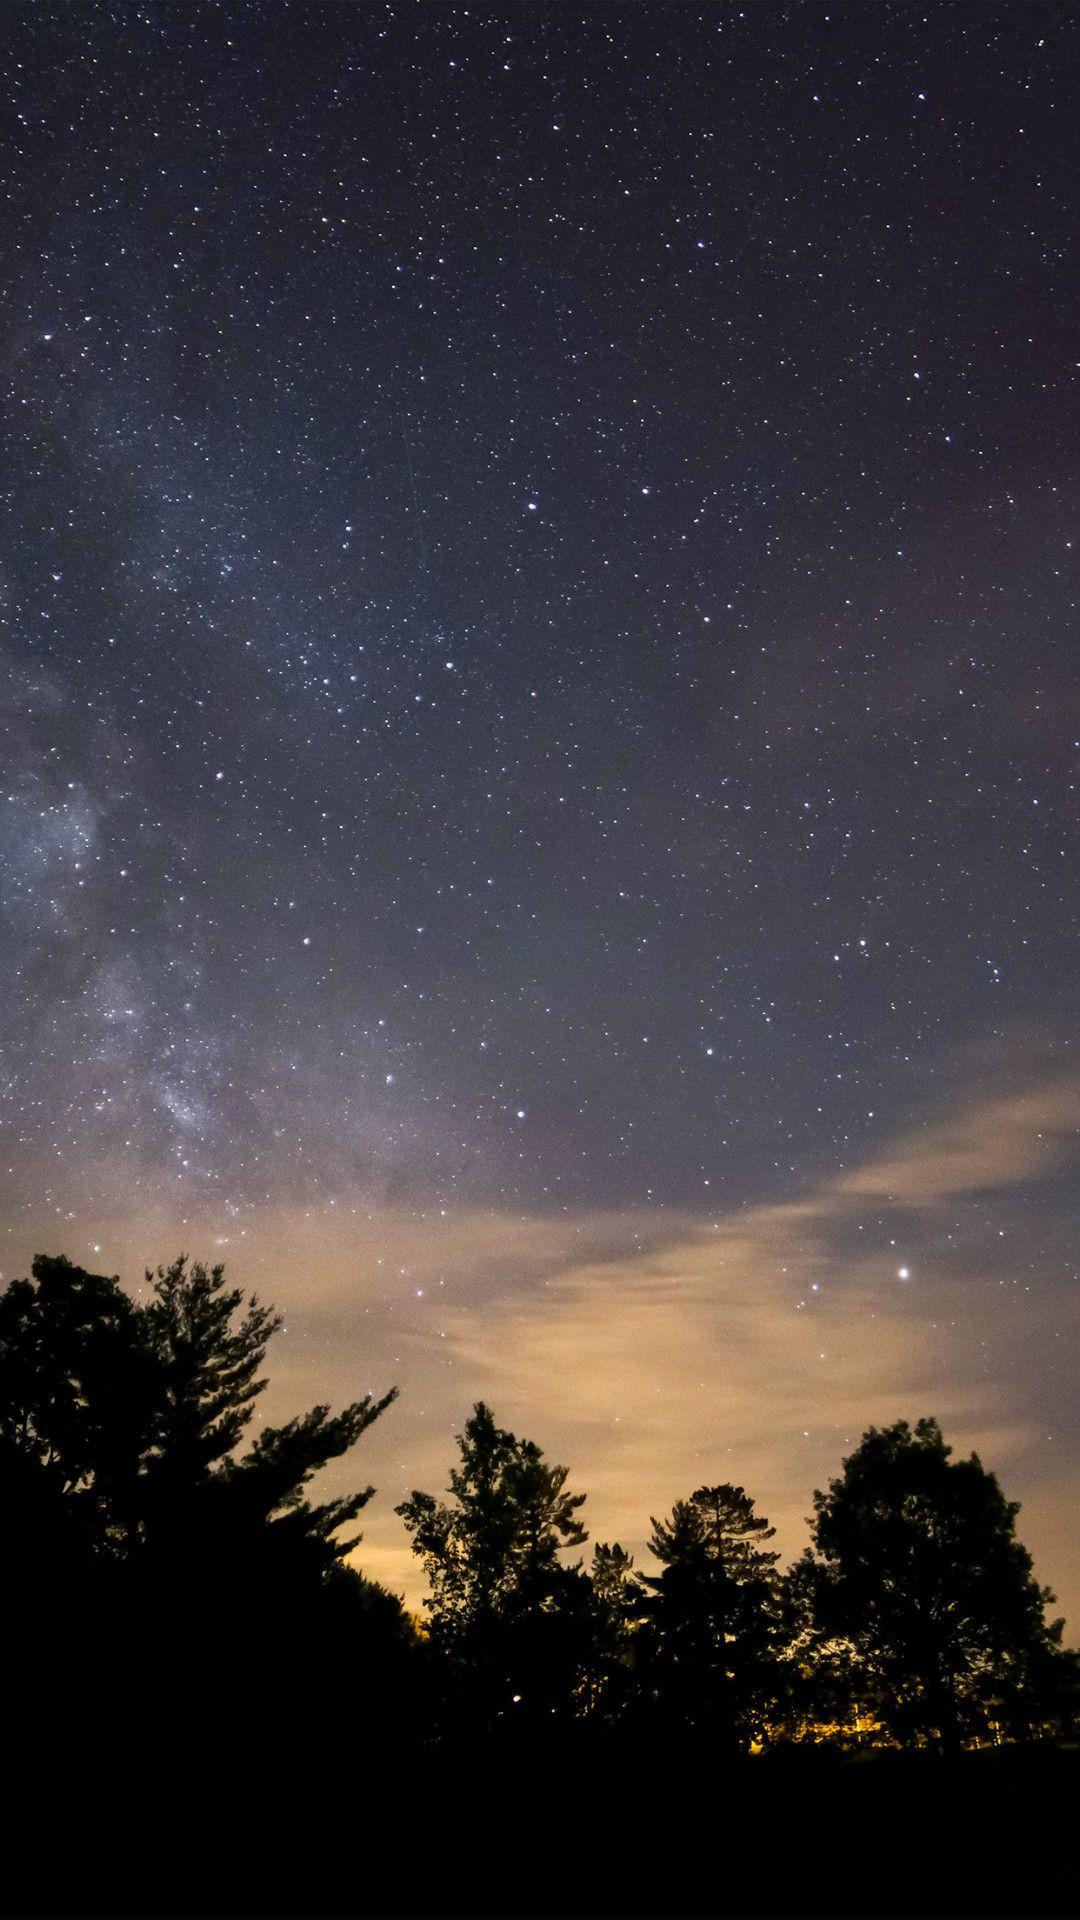 Sky Night Star Dark Mountain Cloud Shadow Iphone 8 Wallpapers